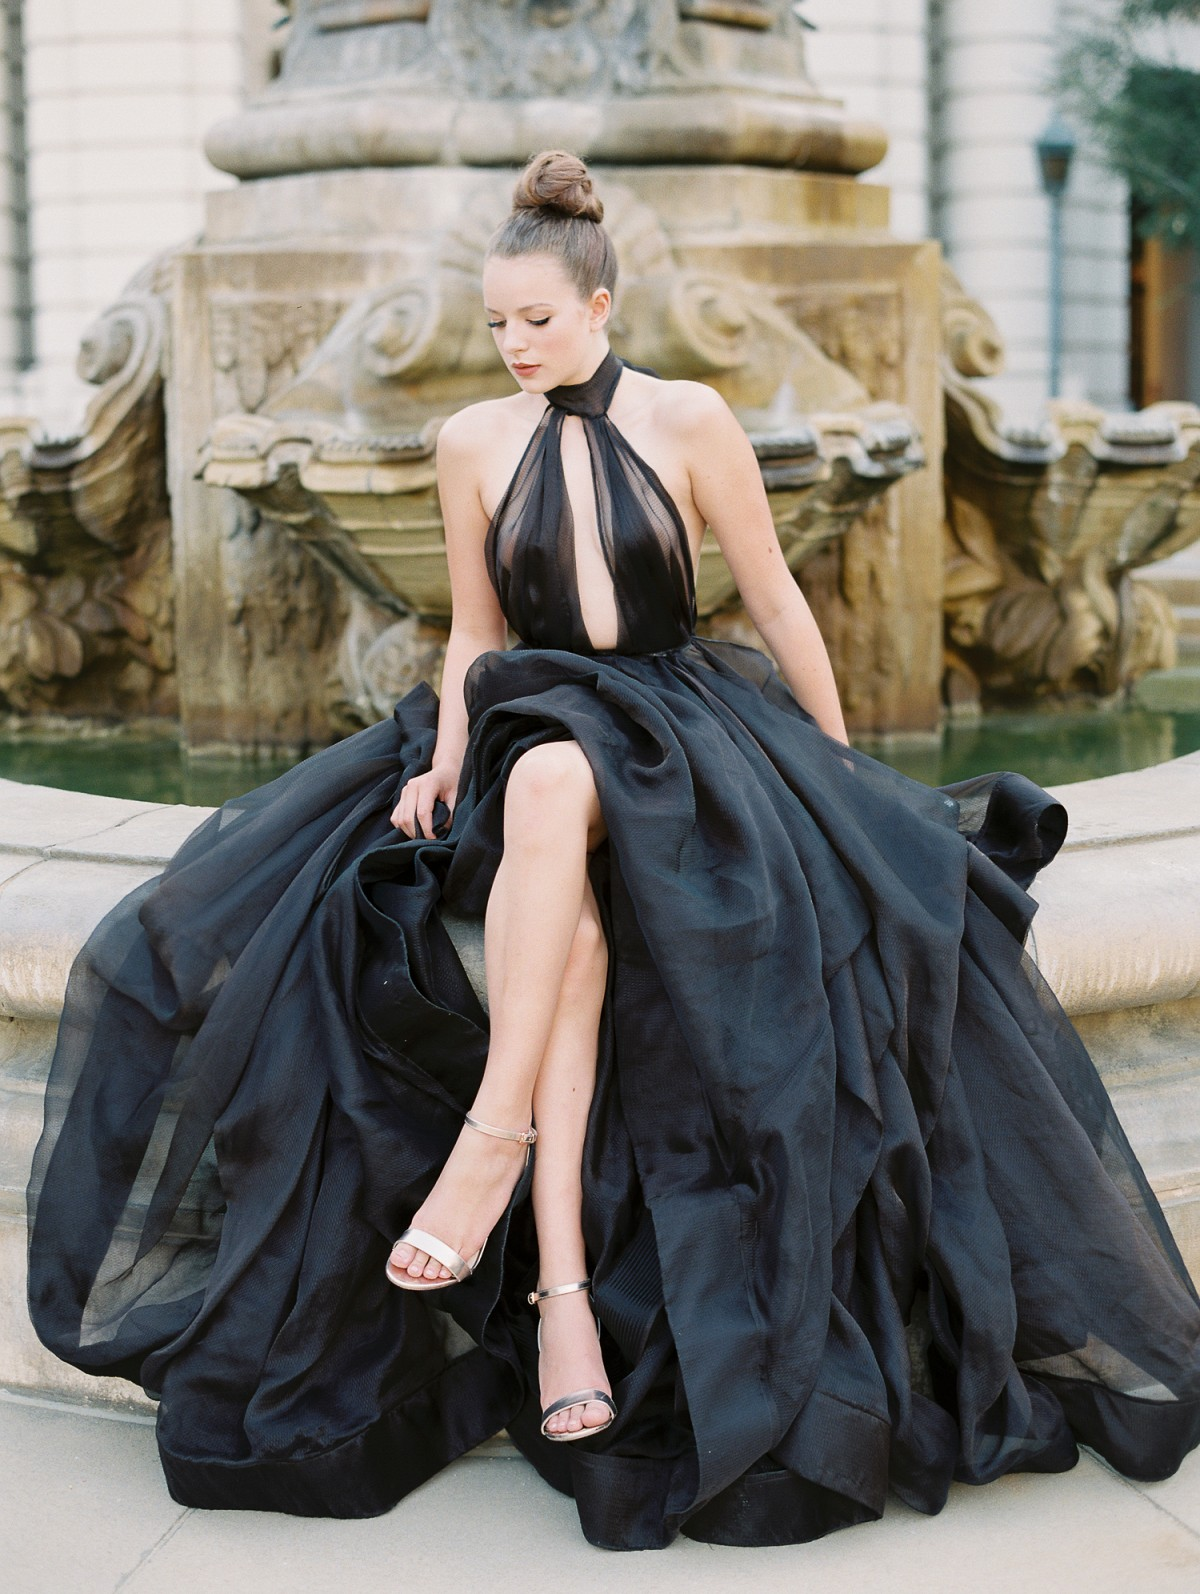 An Opulent Black Gown Exuding Elegance for a Halloween Wedding